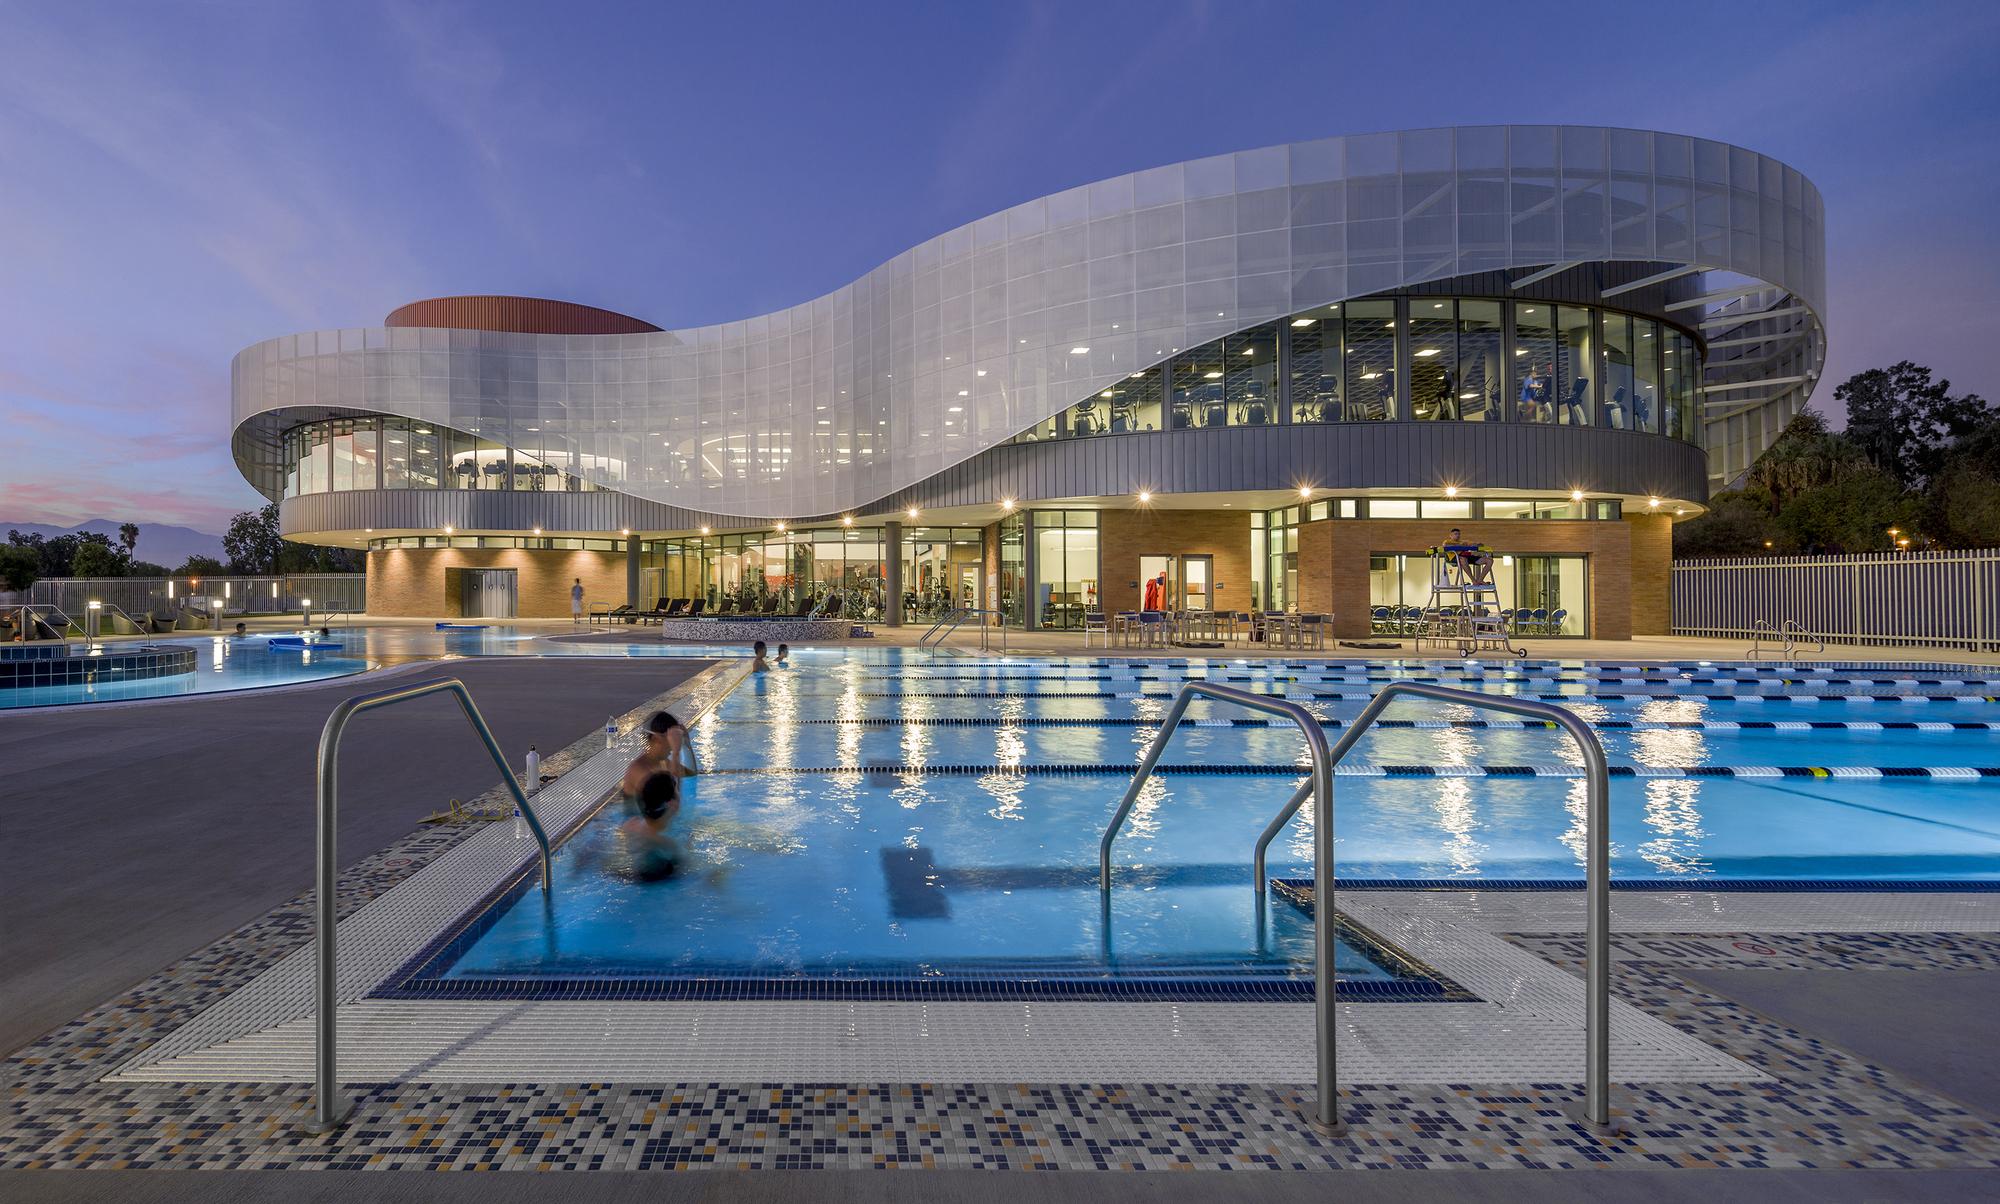 Uc Riverside Student Recreation Center Expansion